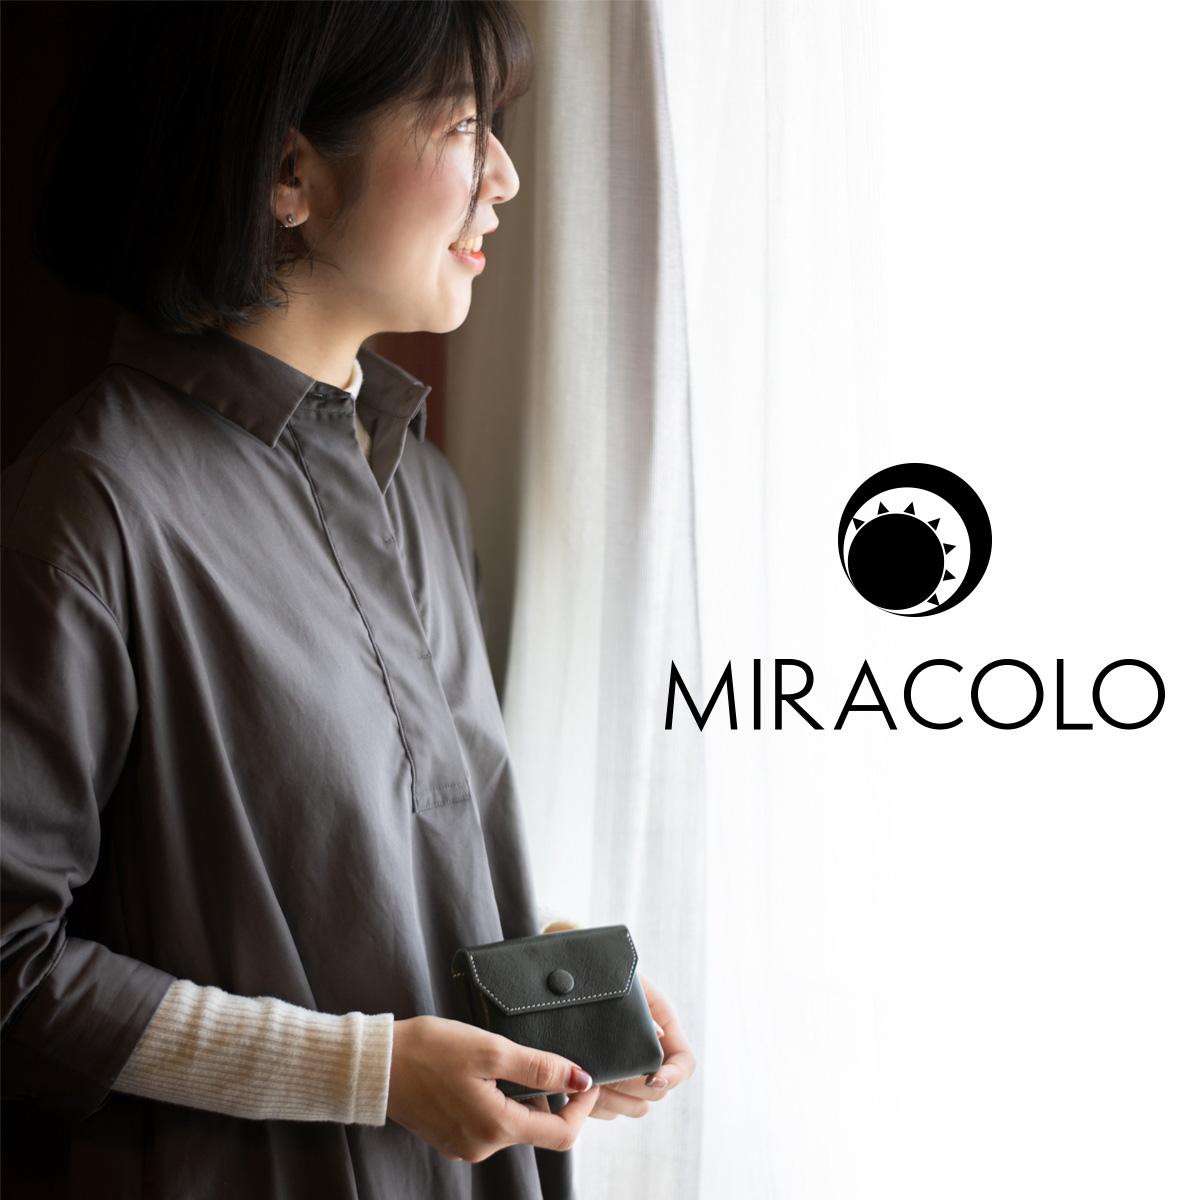 MIRACOLO 本革 イタリアンレザー 小さい財布